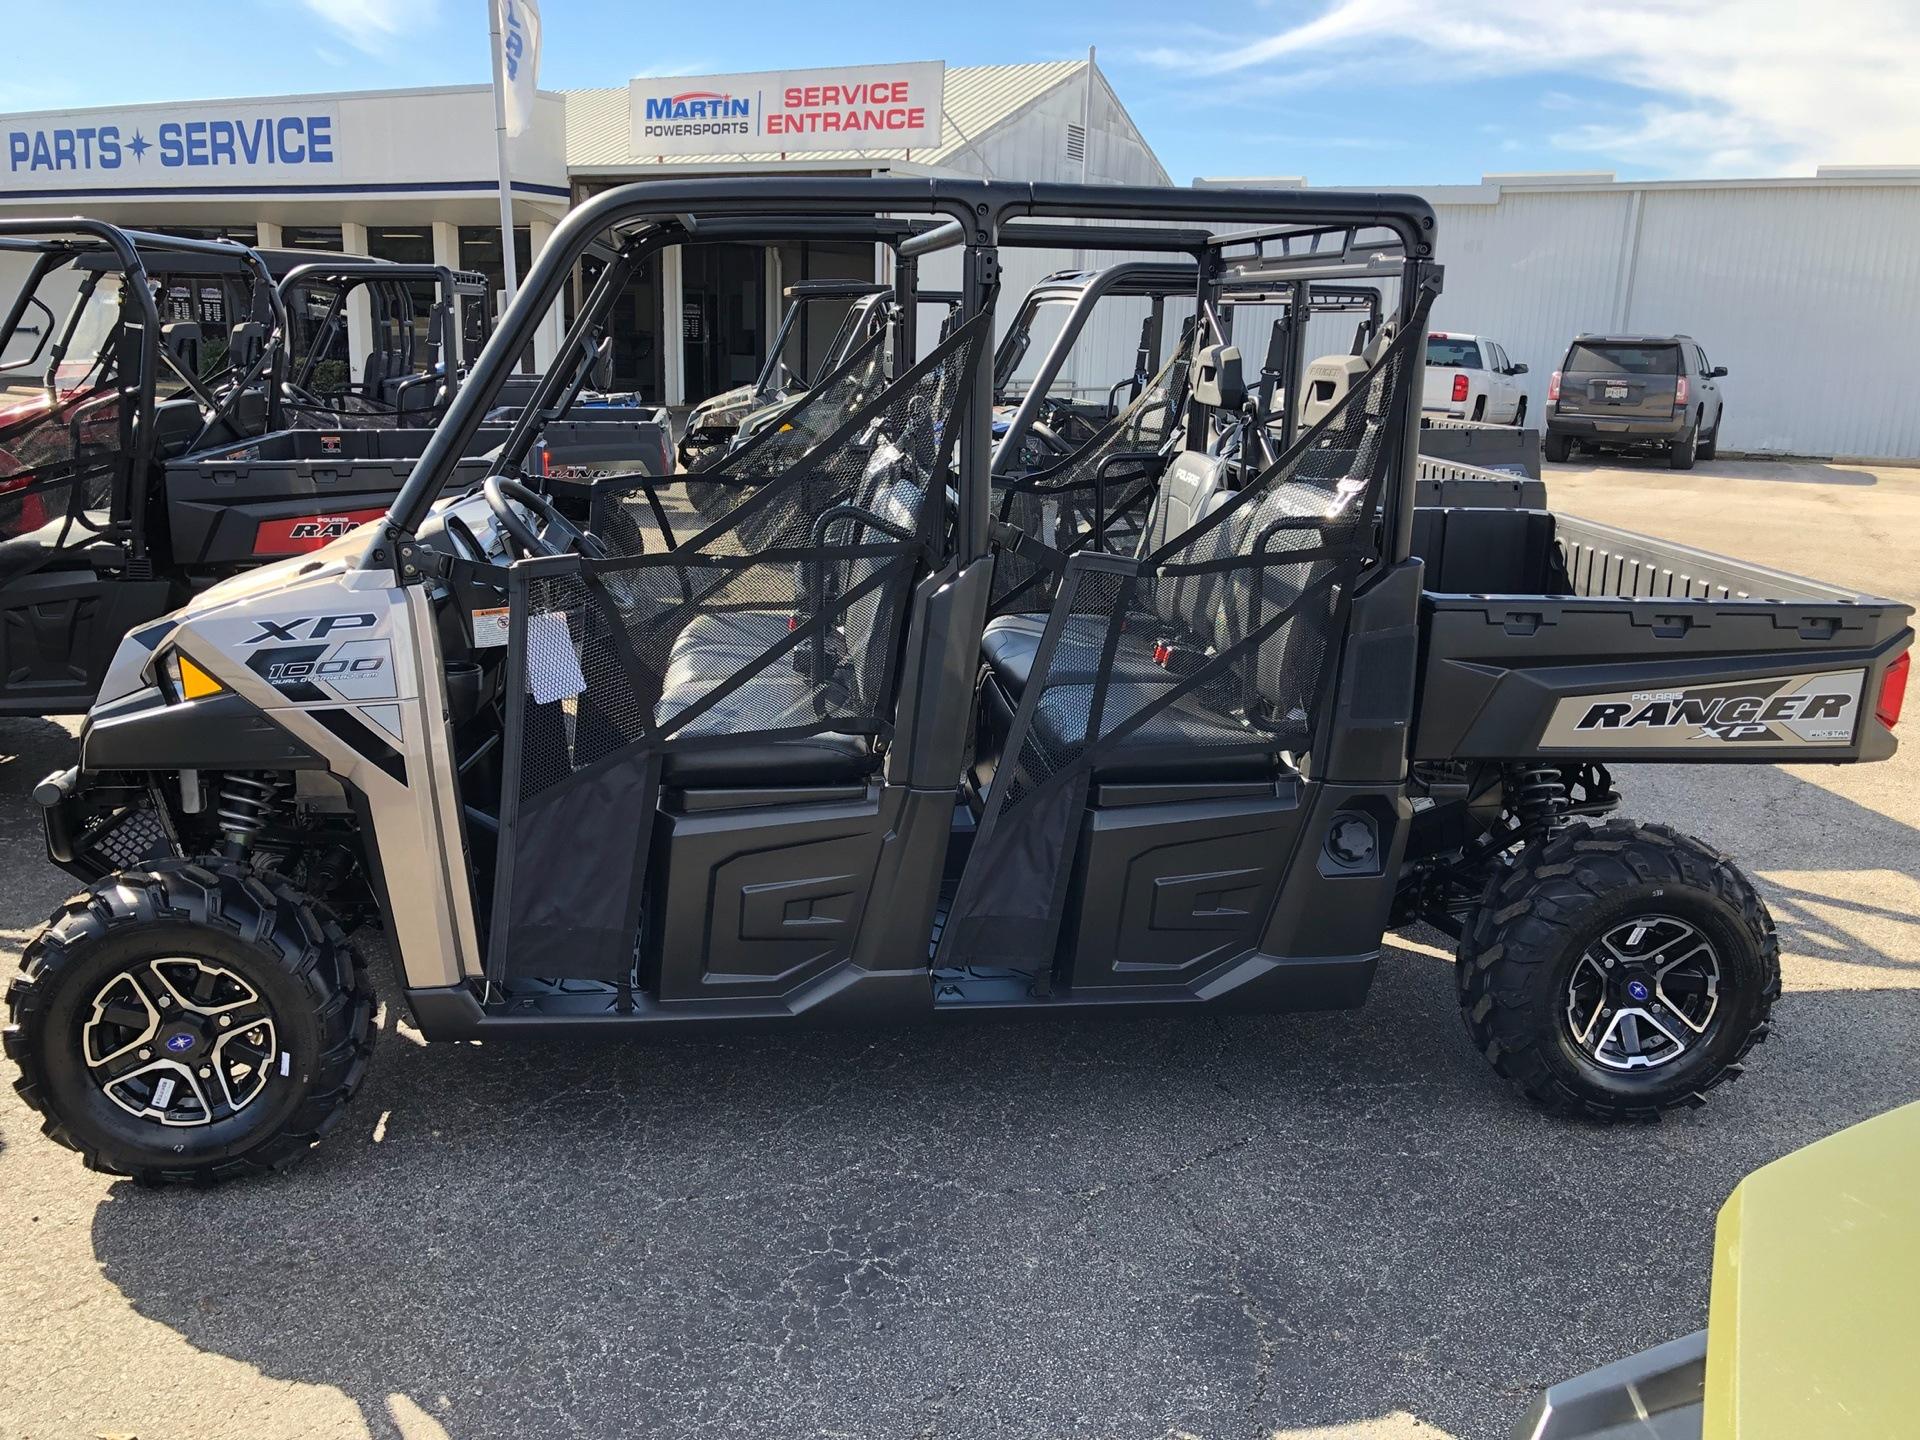 2018 Polaris Ranger Crew XP 1000 EPS for sale 2736